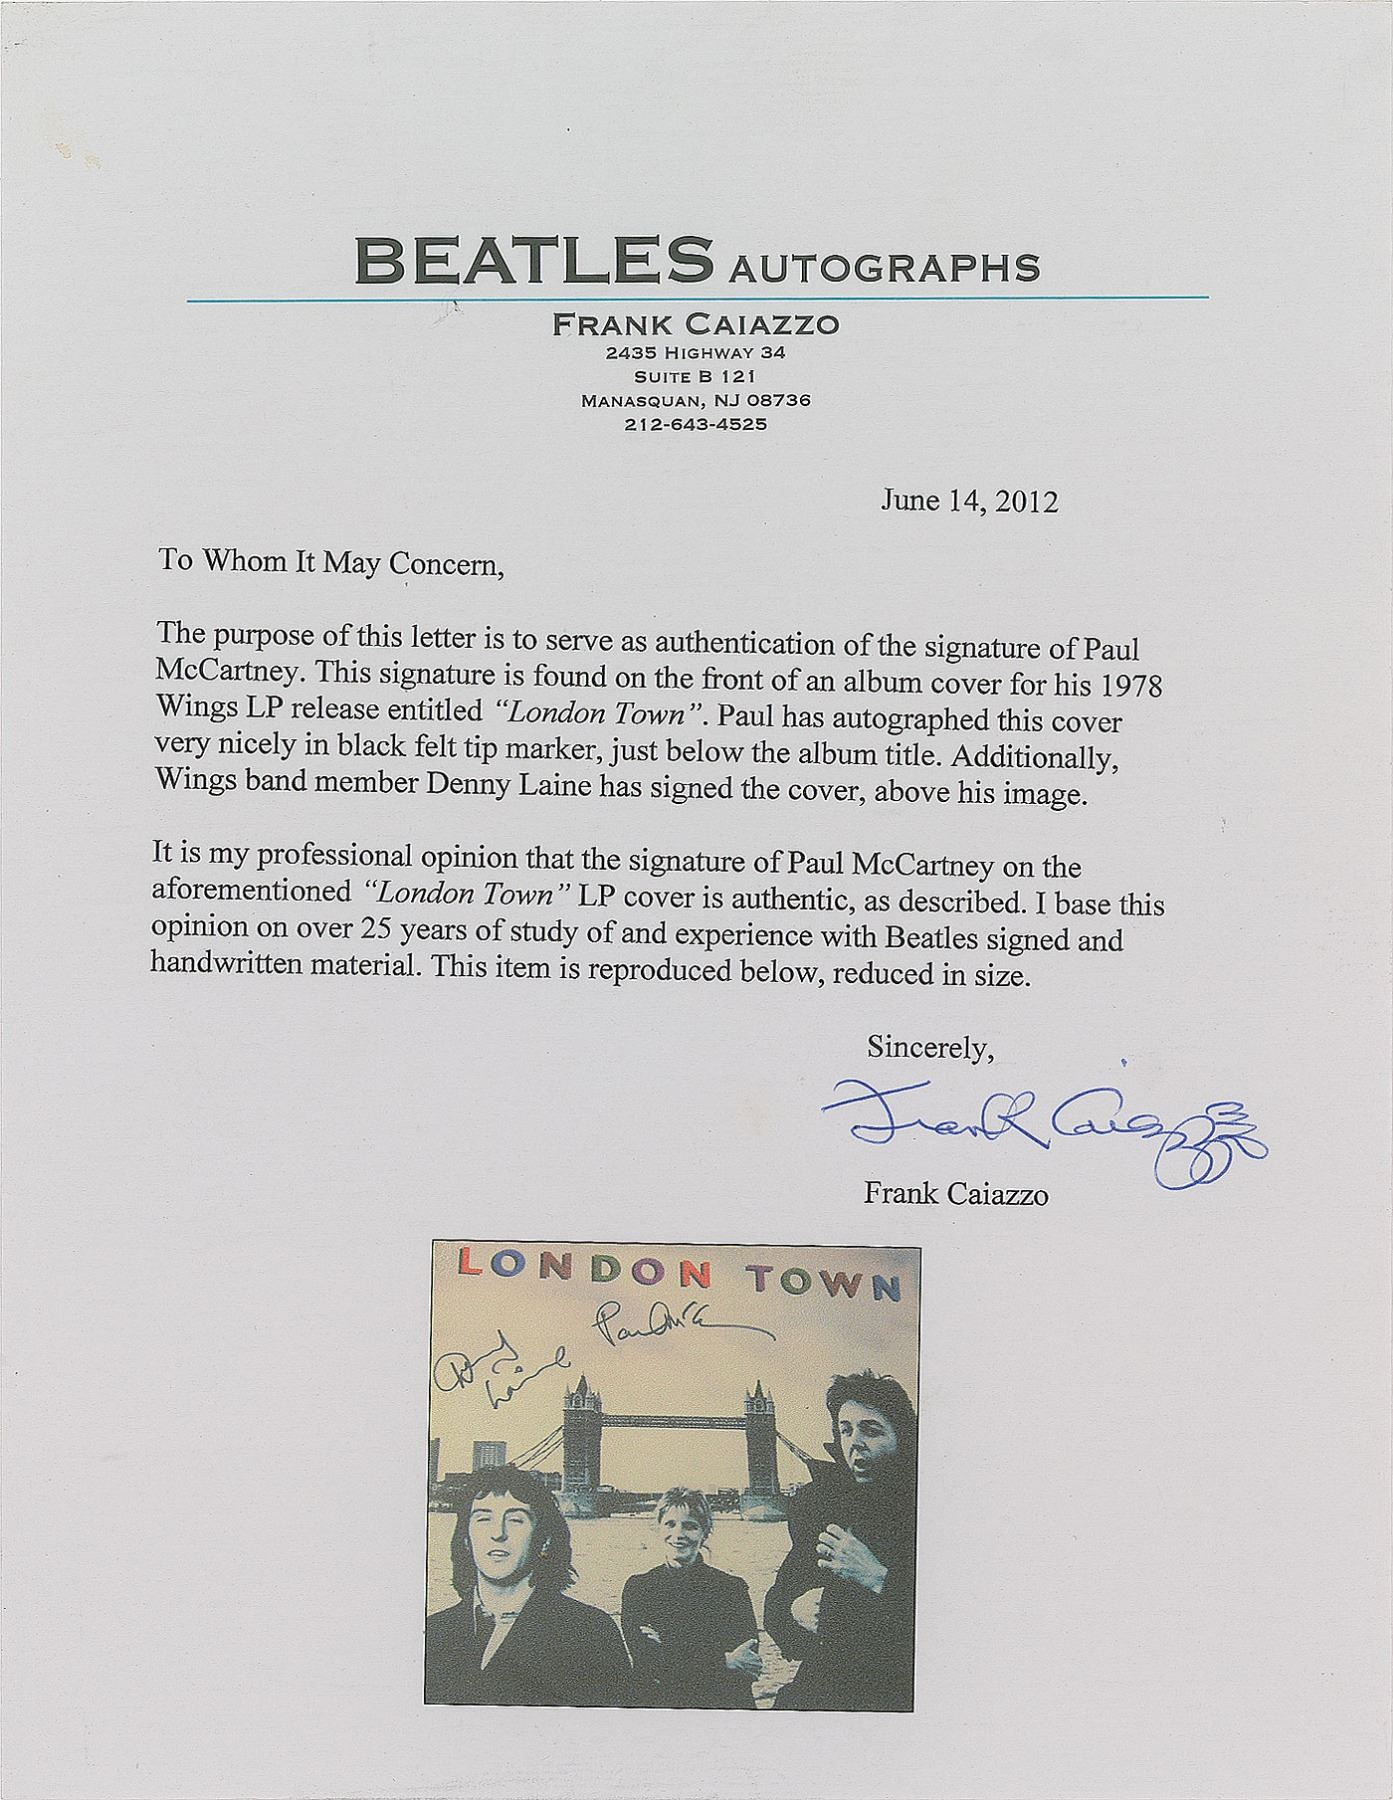 Paul McCartney and Denny Laine Signed Album